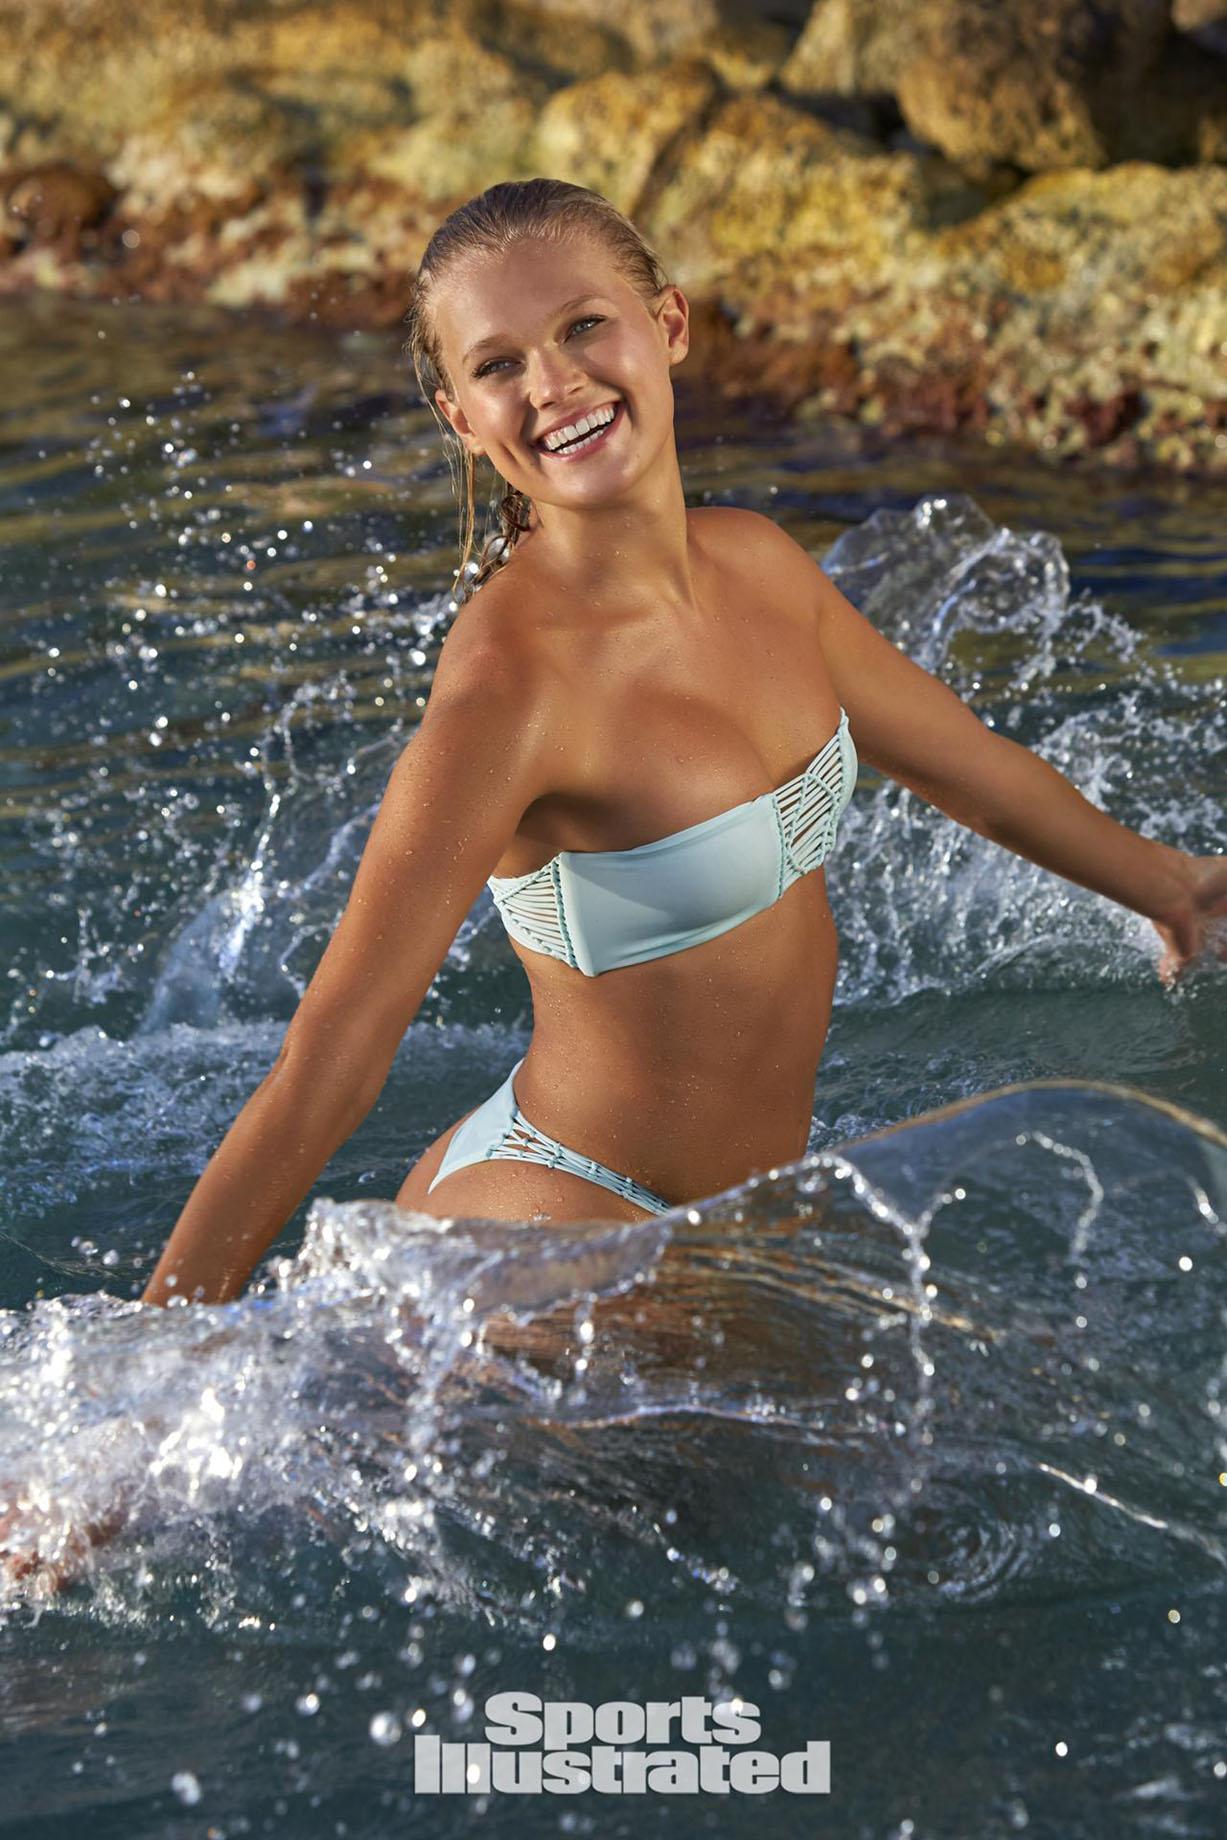 Vita Sidorkina / Вита Сидоркина в купальниках из новой коллекции Sports Illustrated Swimsuit 2017 issue / in Curacao by Ben Watts